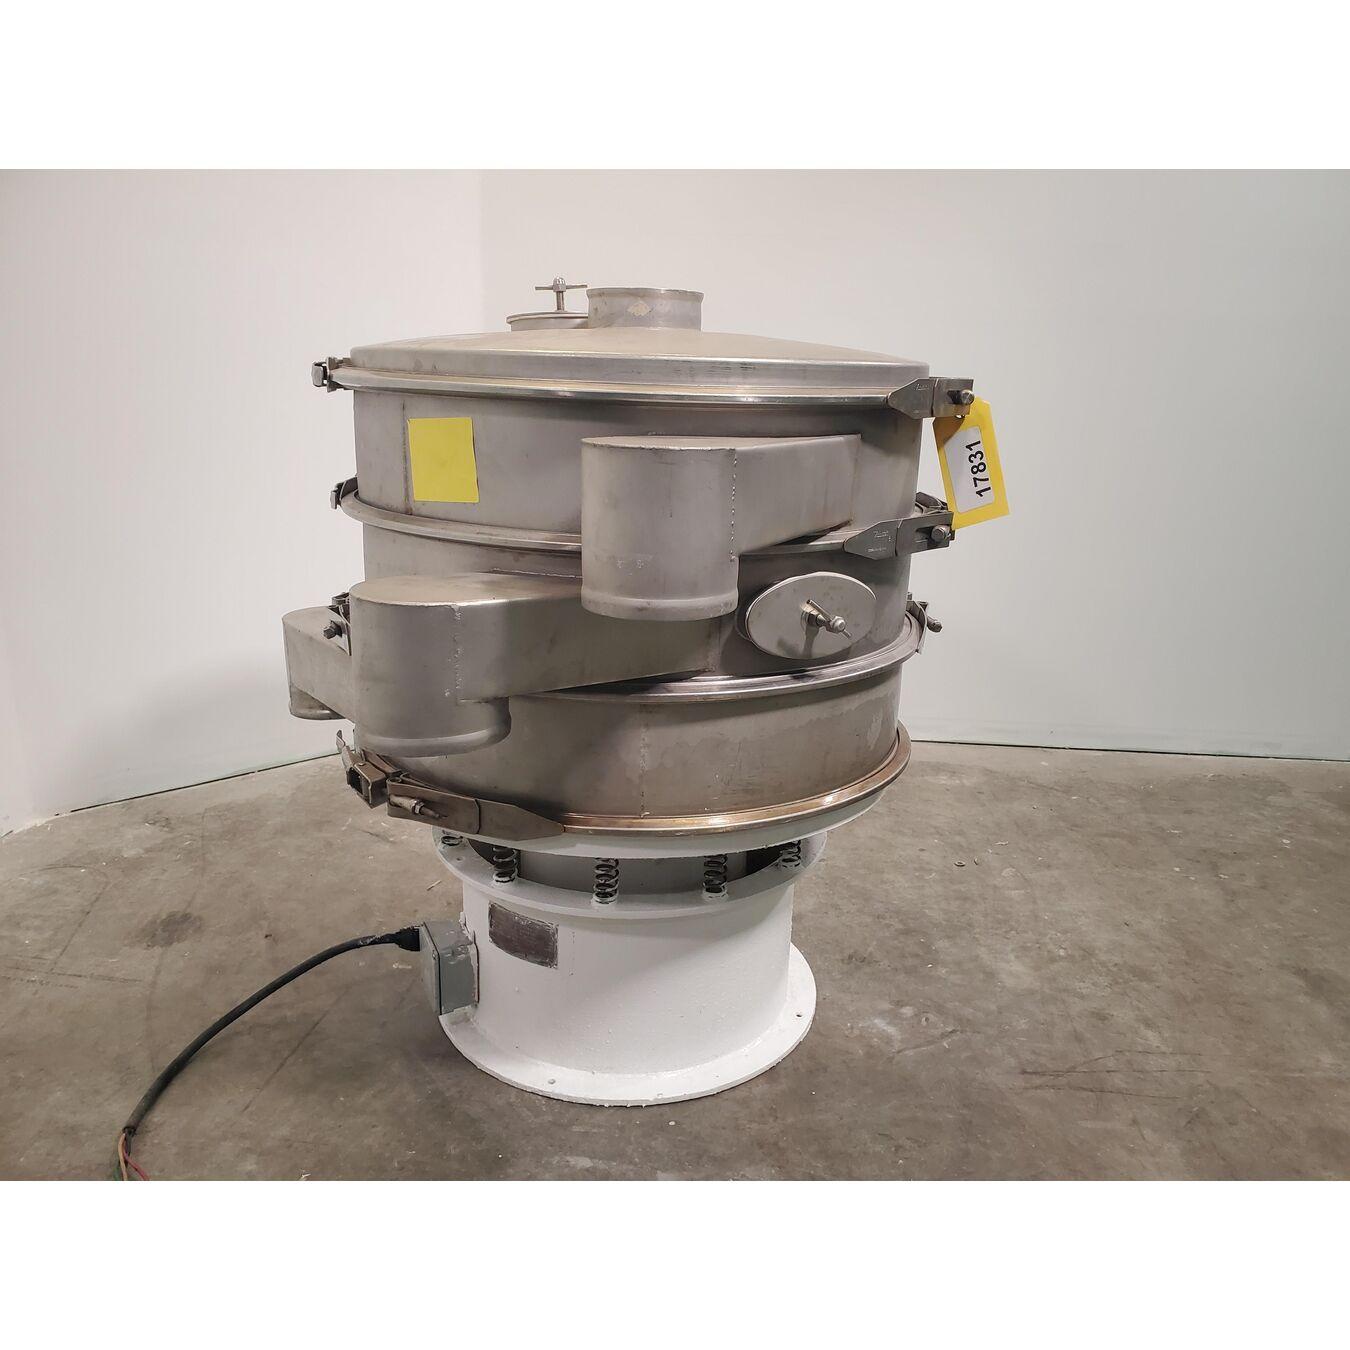 Vibro Sifter - Vibro Screen, Powder Sieving Machine